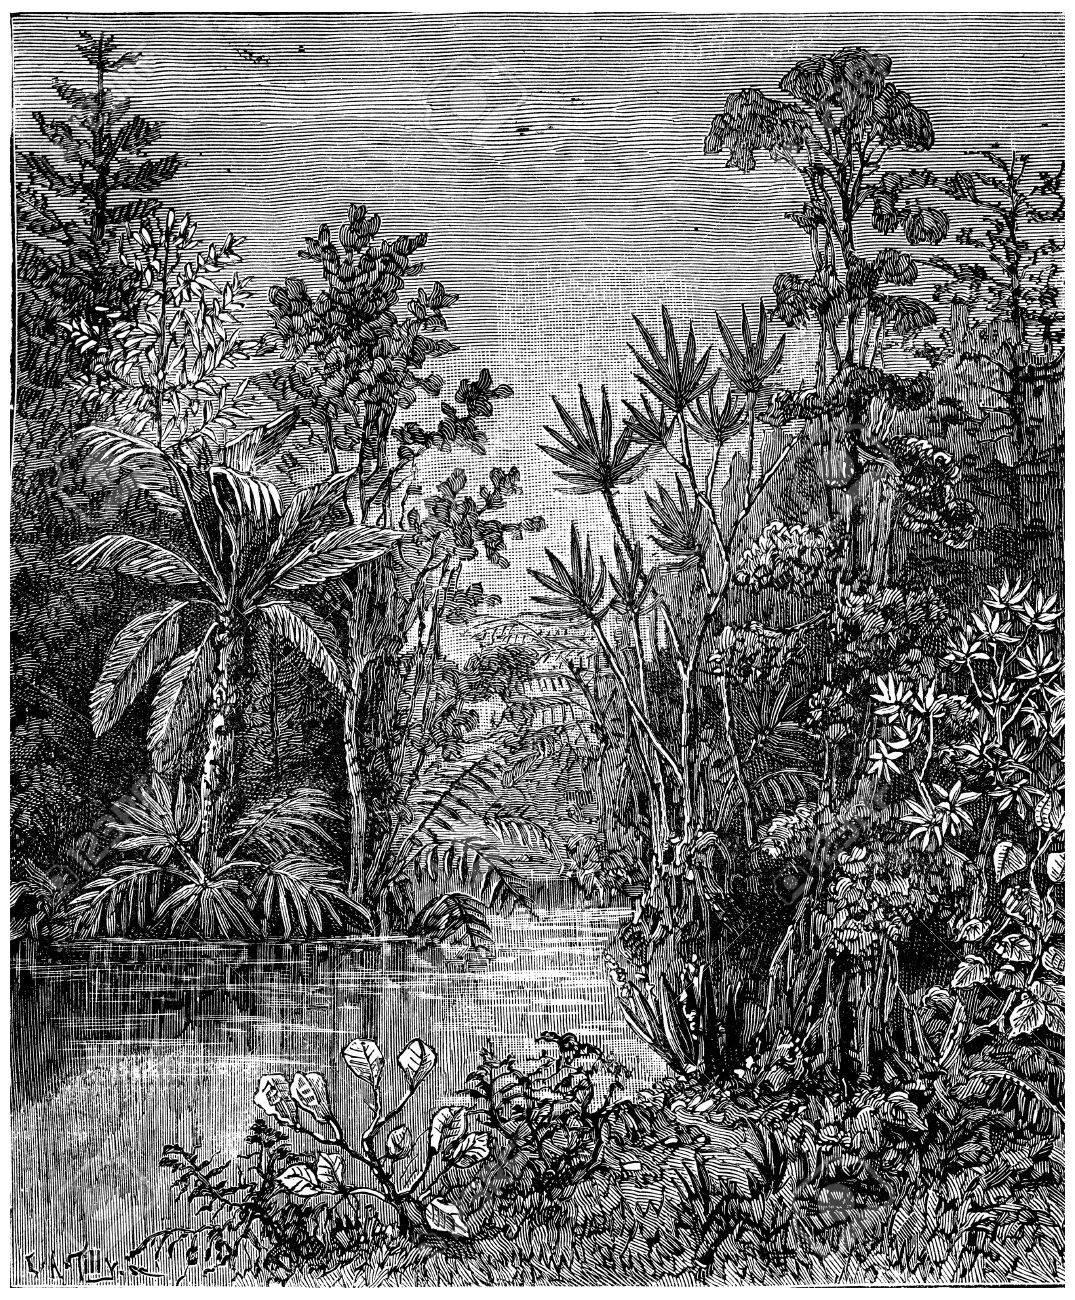 Plant landscape of the Cretaceous period, Bohemia, vintage engraved illustration. Earth before man – 1886. - 39497389